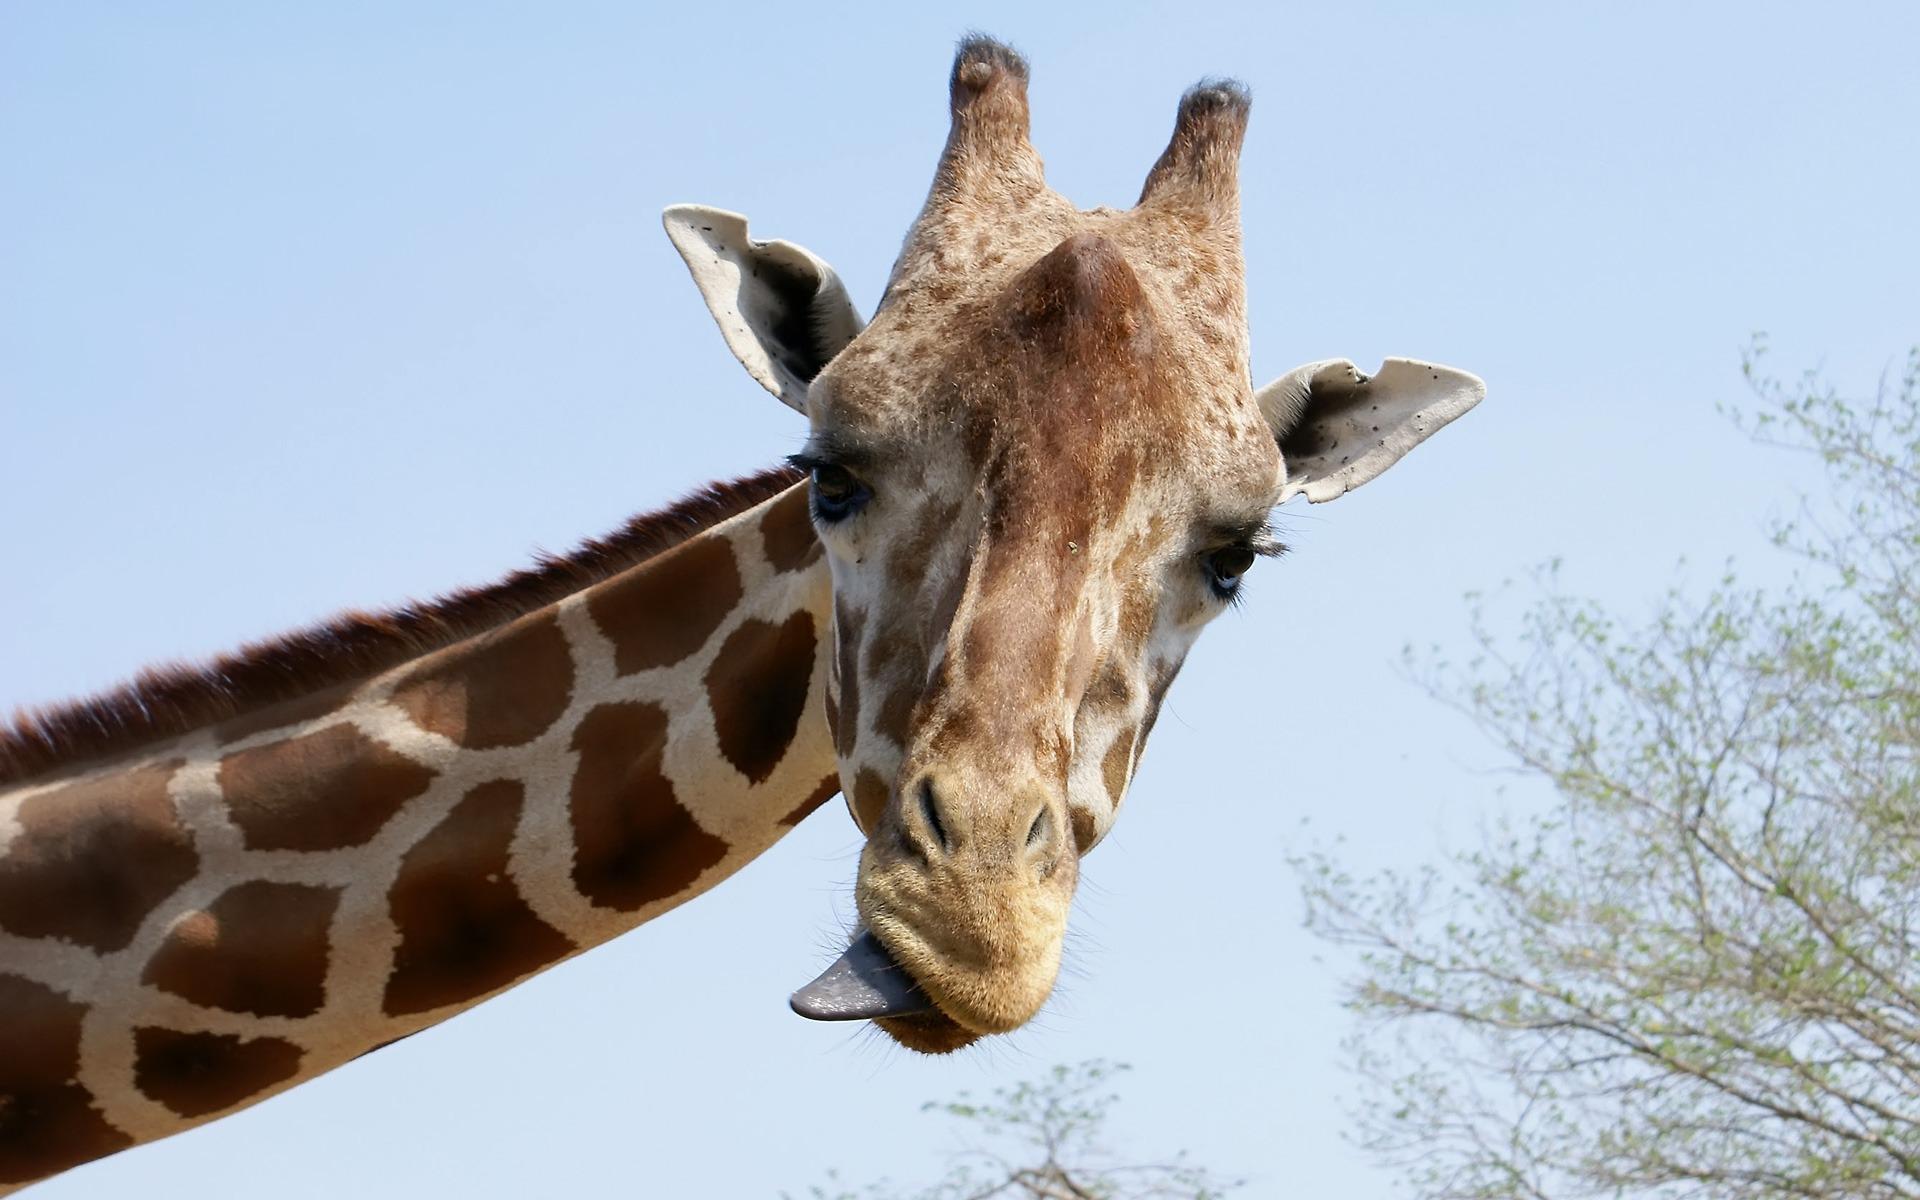 giraffe images free